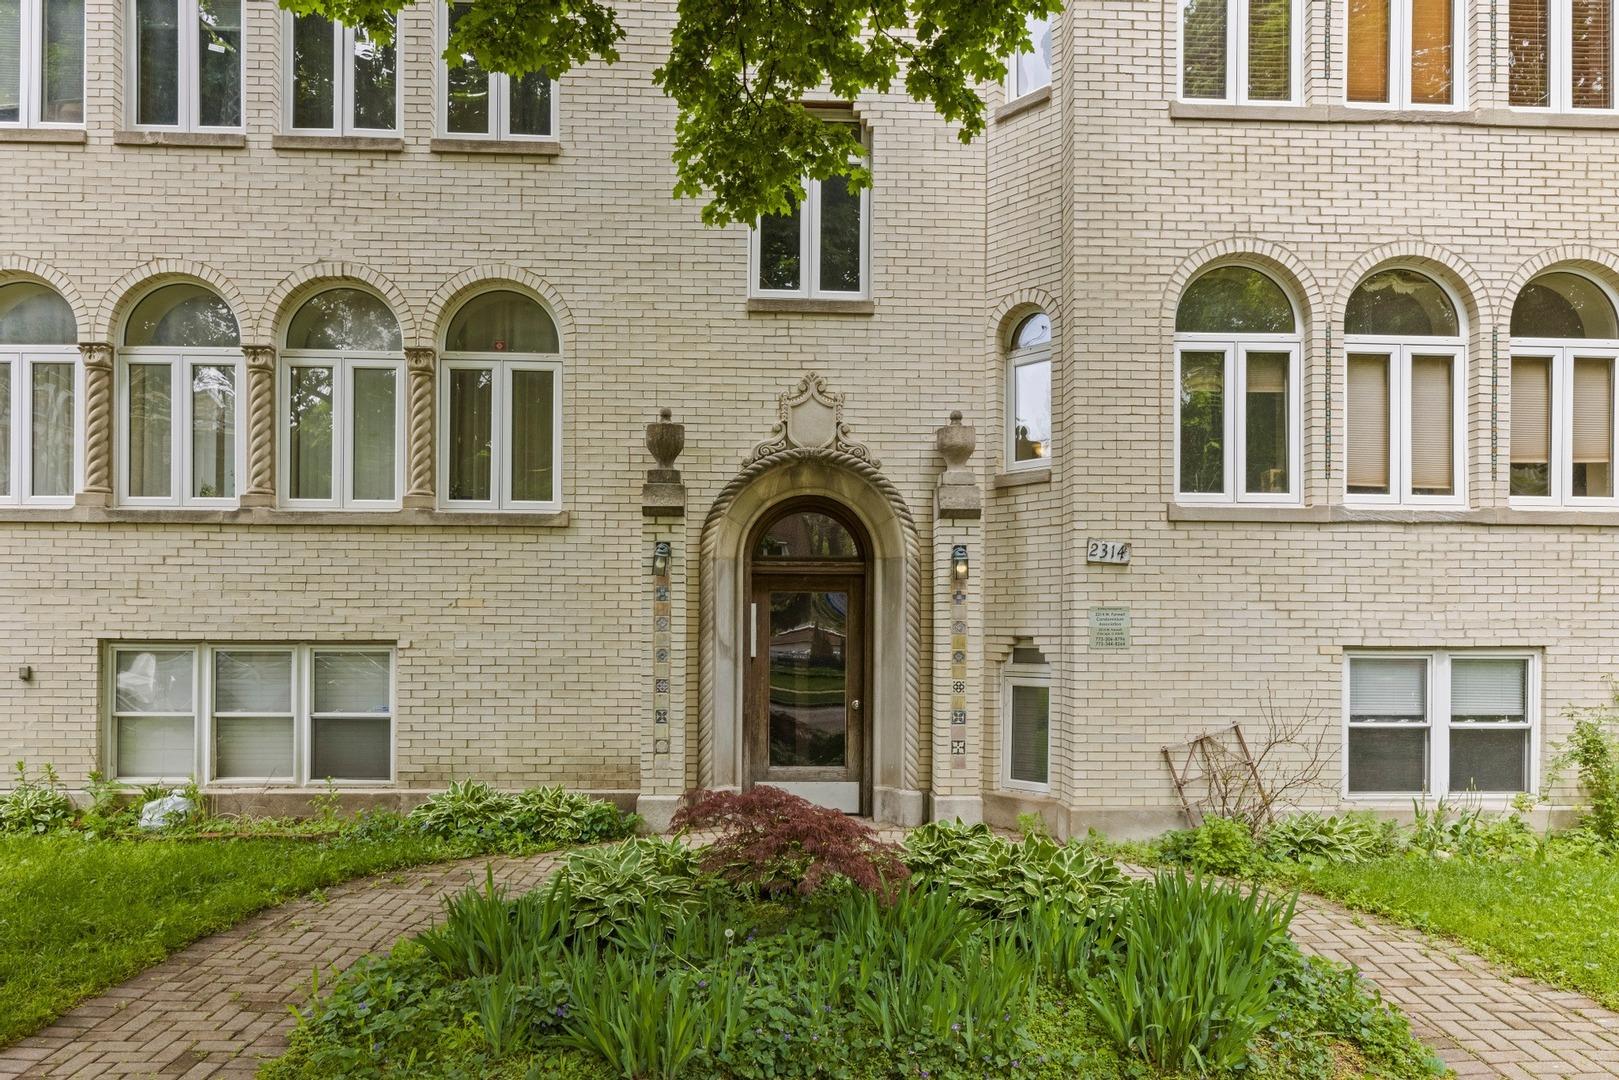 2314 Farwell Unit Unit 3w ,Chicago, Illinois 60645